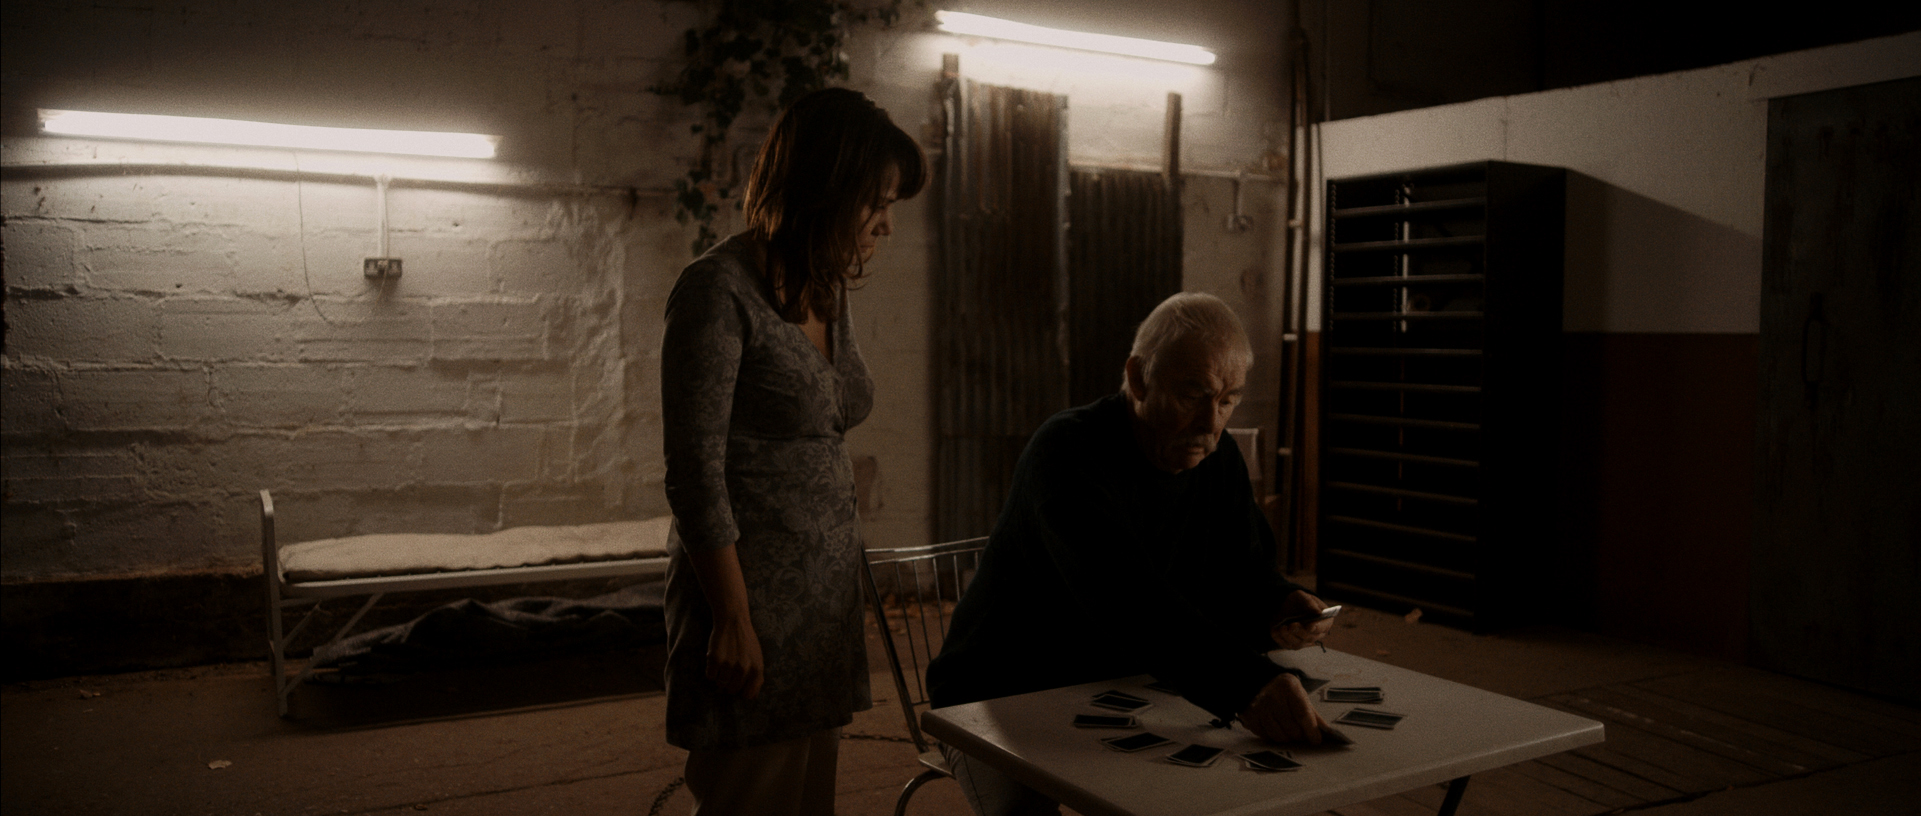 HYVE  2015 Create Films / dir: Shirley Day